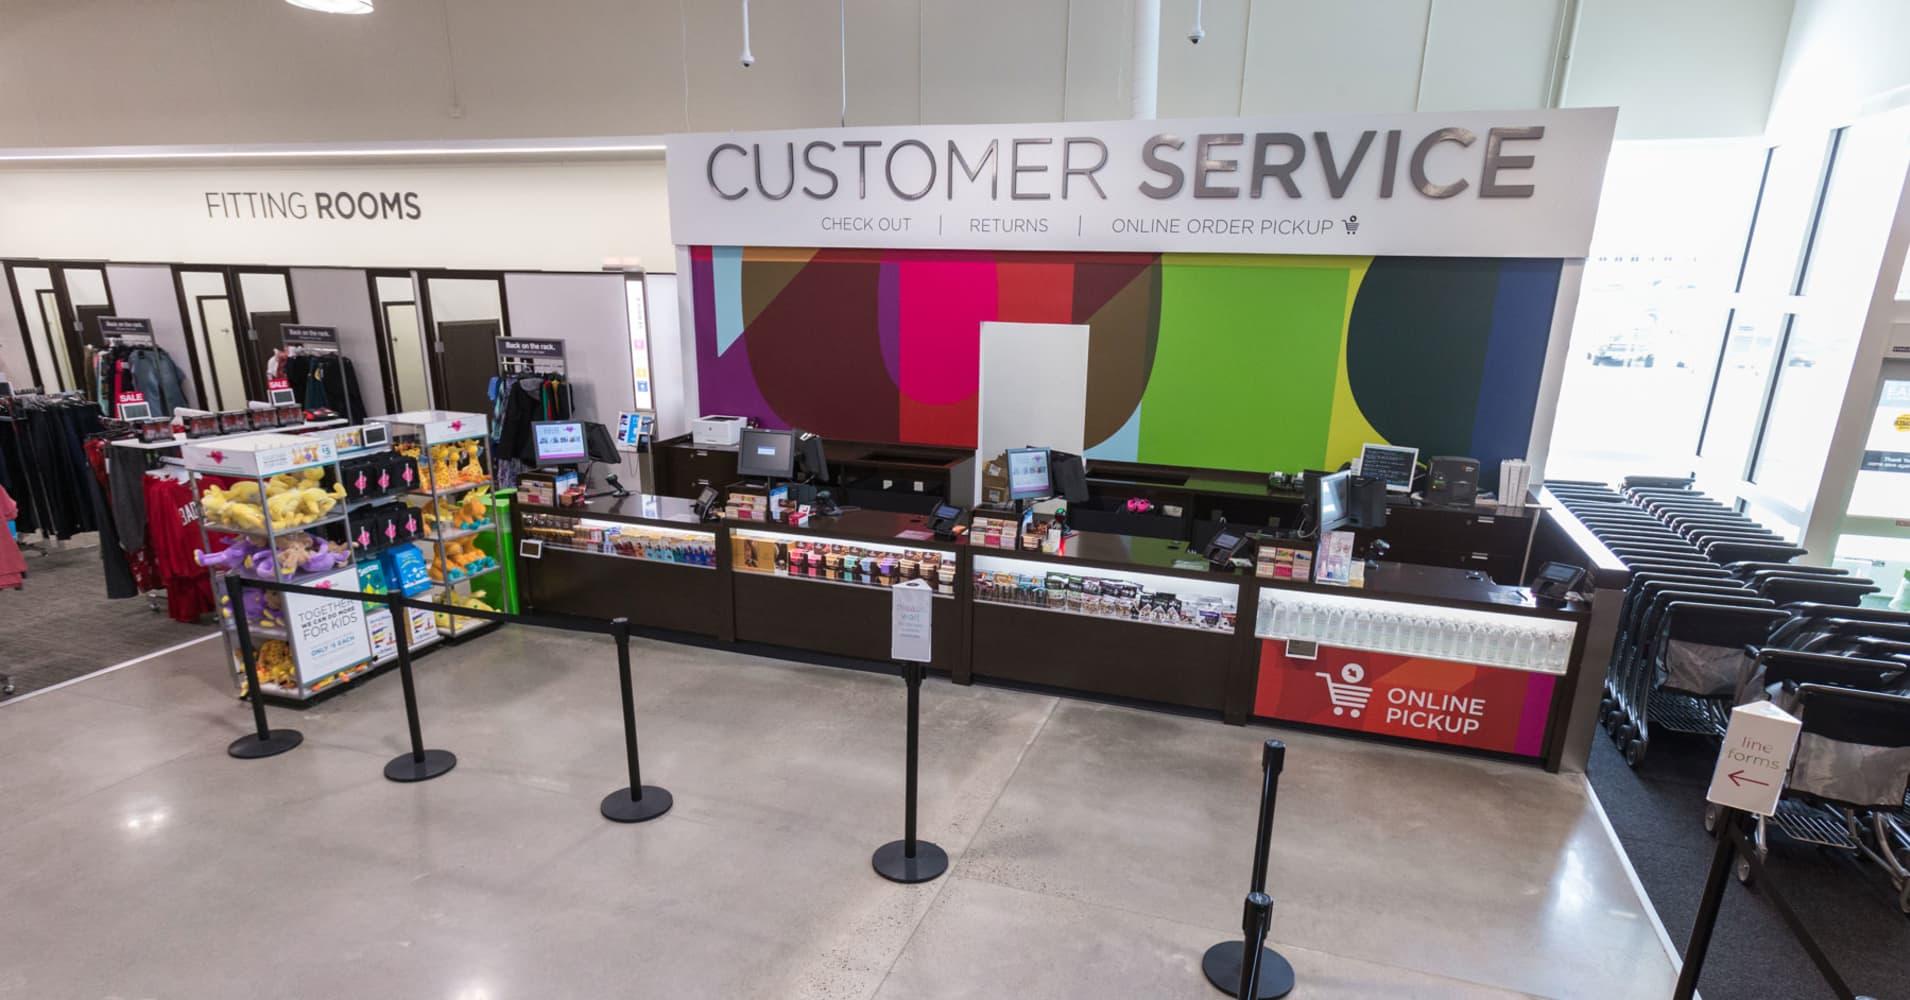 kohls employee self service